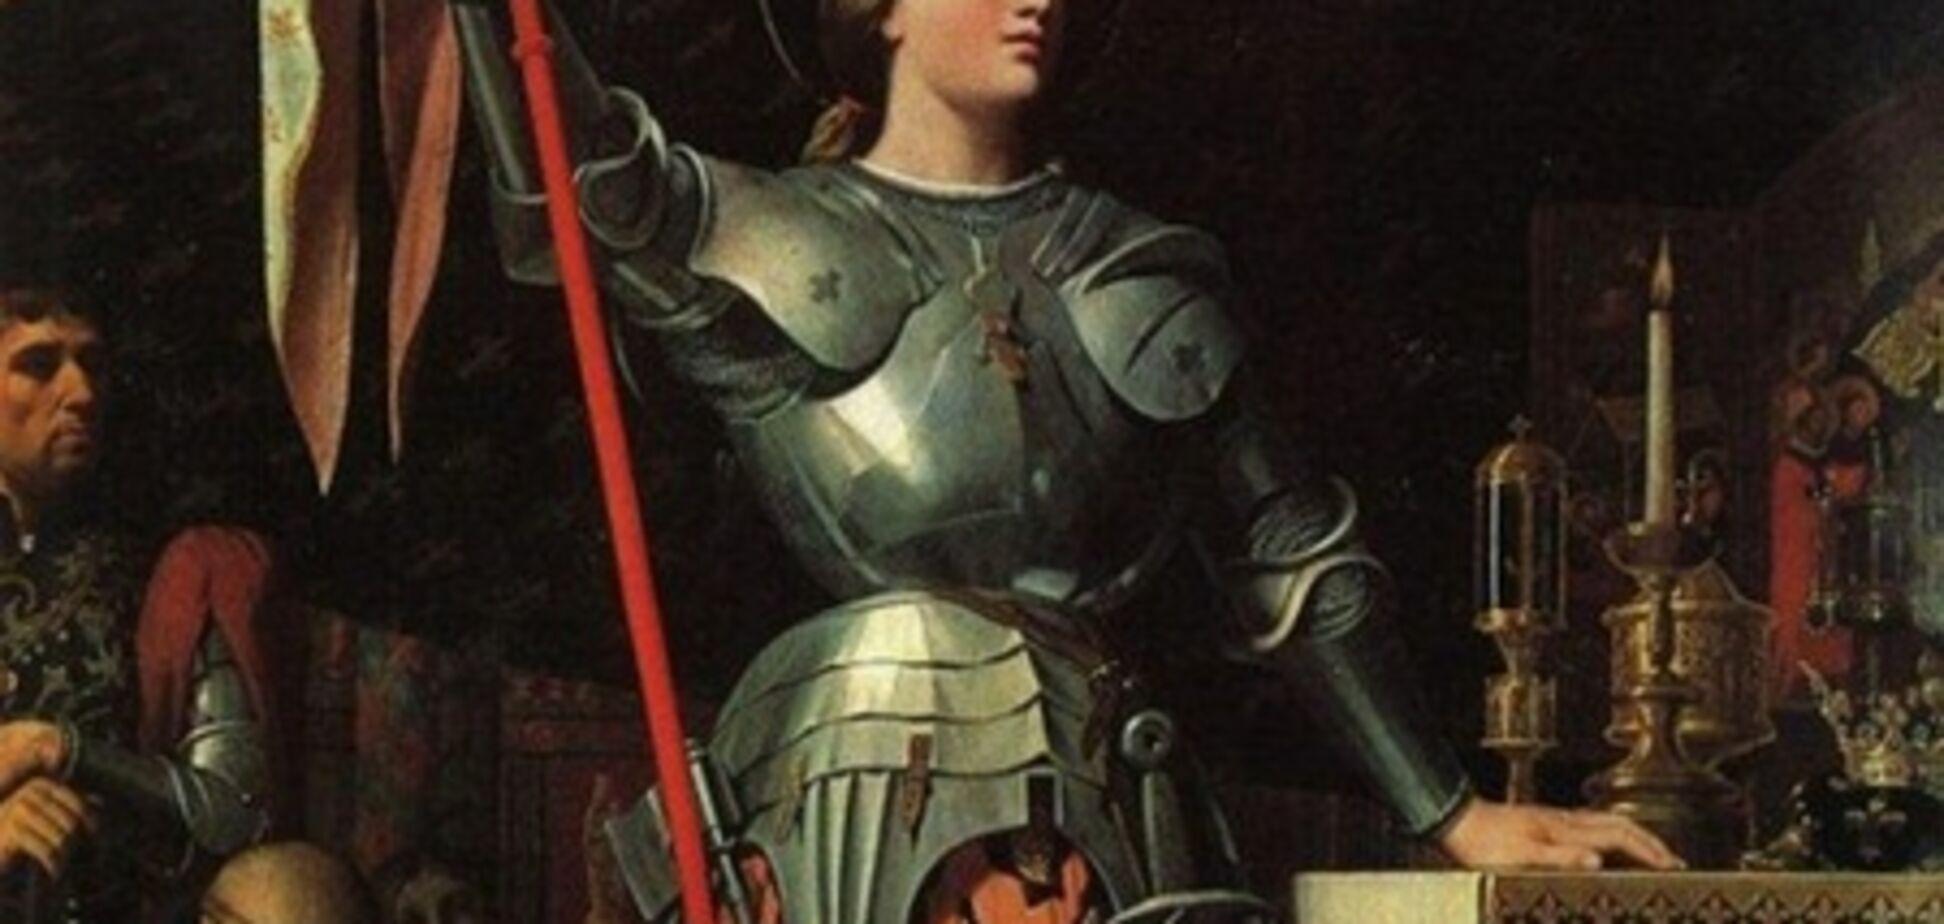 Страшные тайны Жанны д'Арк